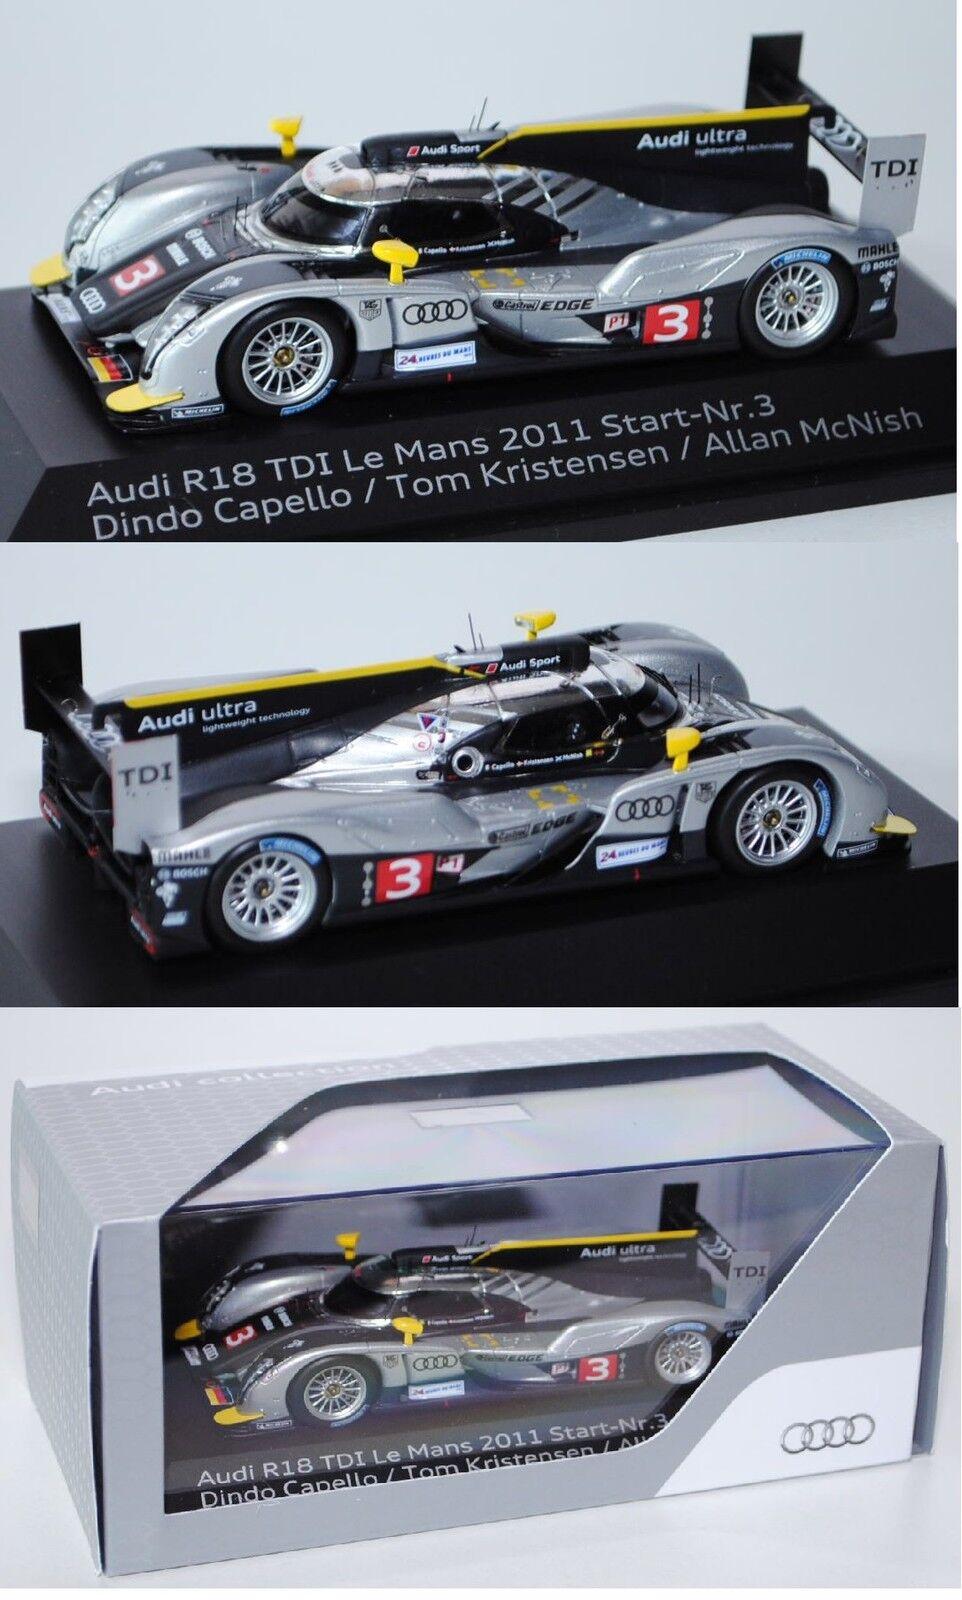 SPARK 1100143 Audi Audi Audi r18 TDI Le Femmes 2011, 1:43, publicitaires boîte 6da3a9